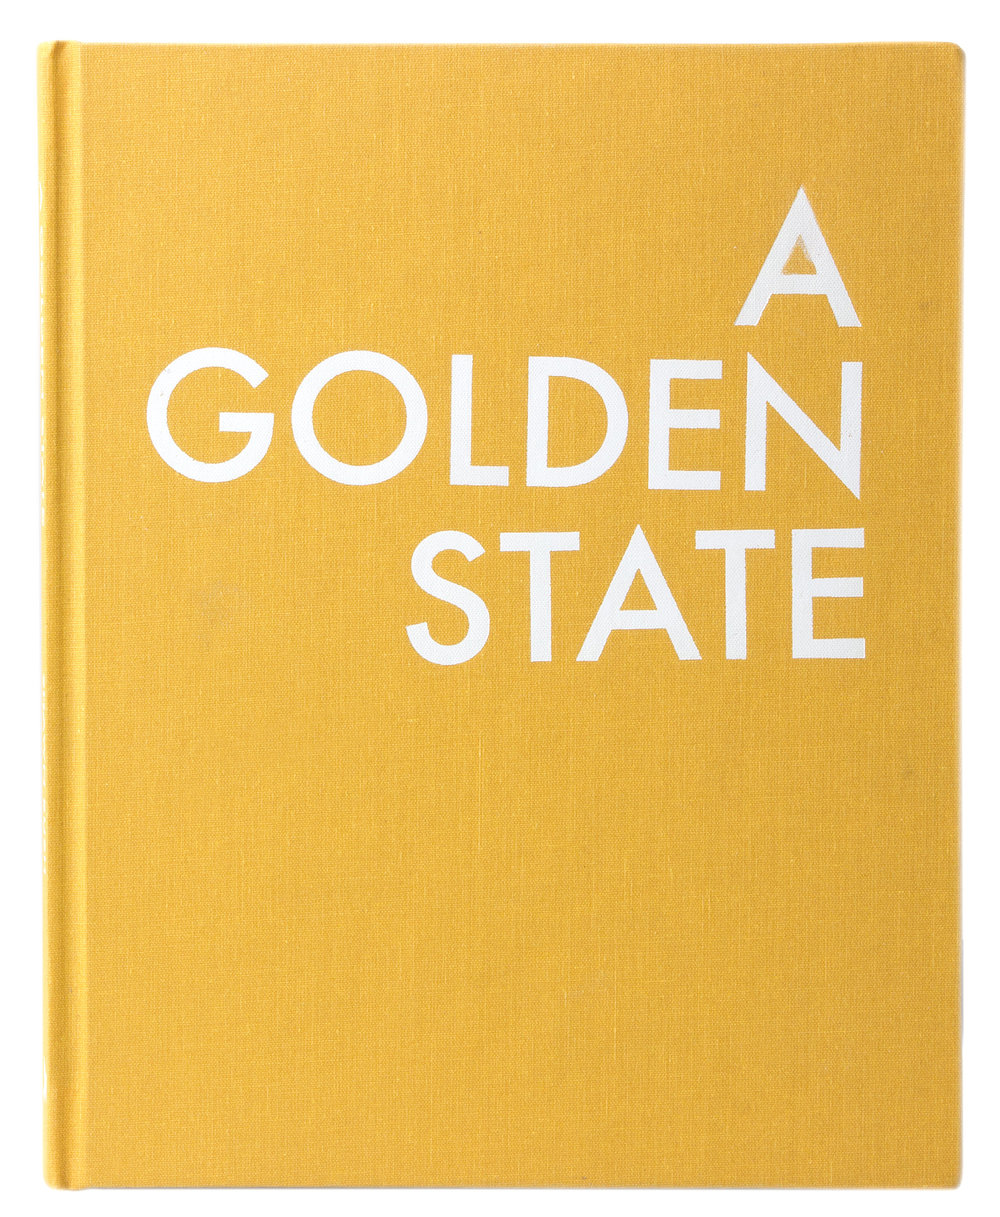 A Golden State